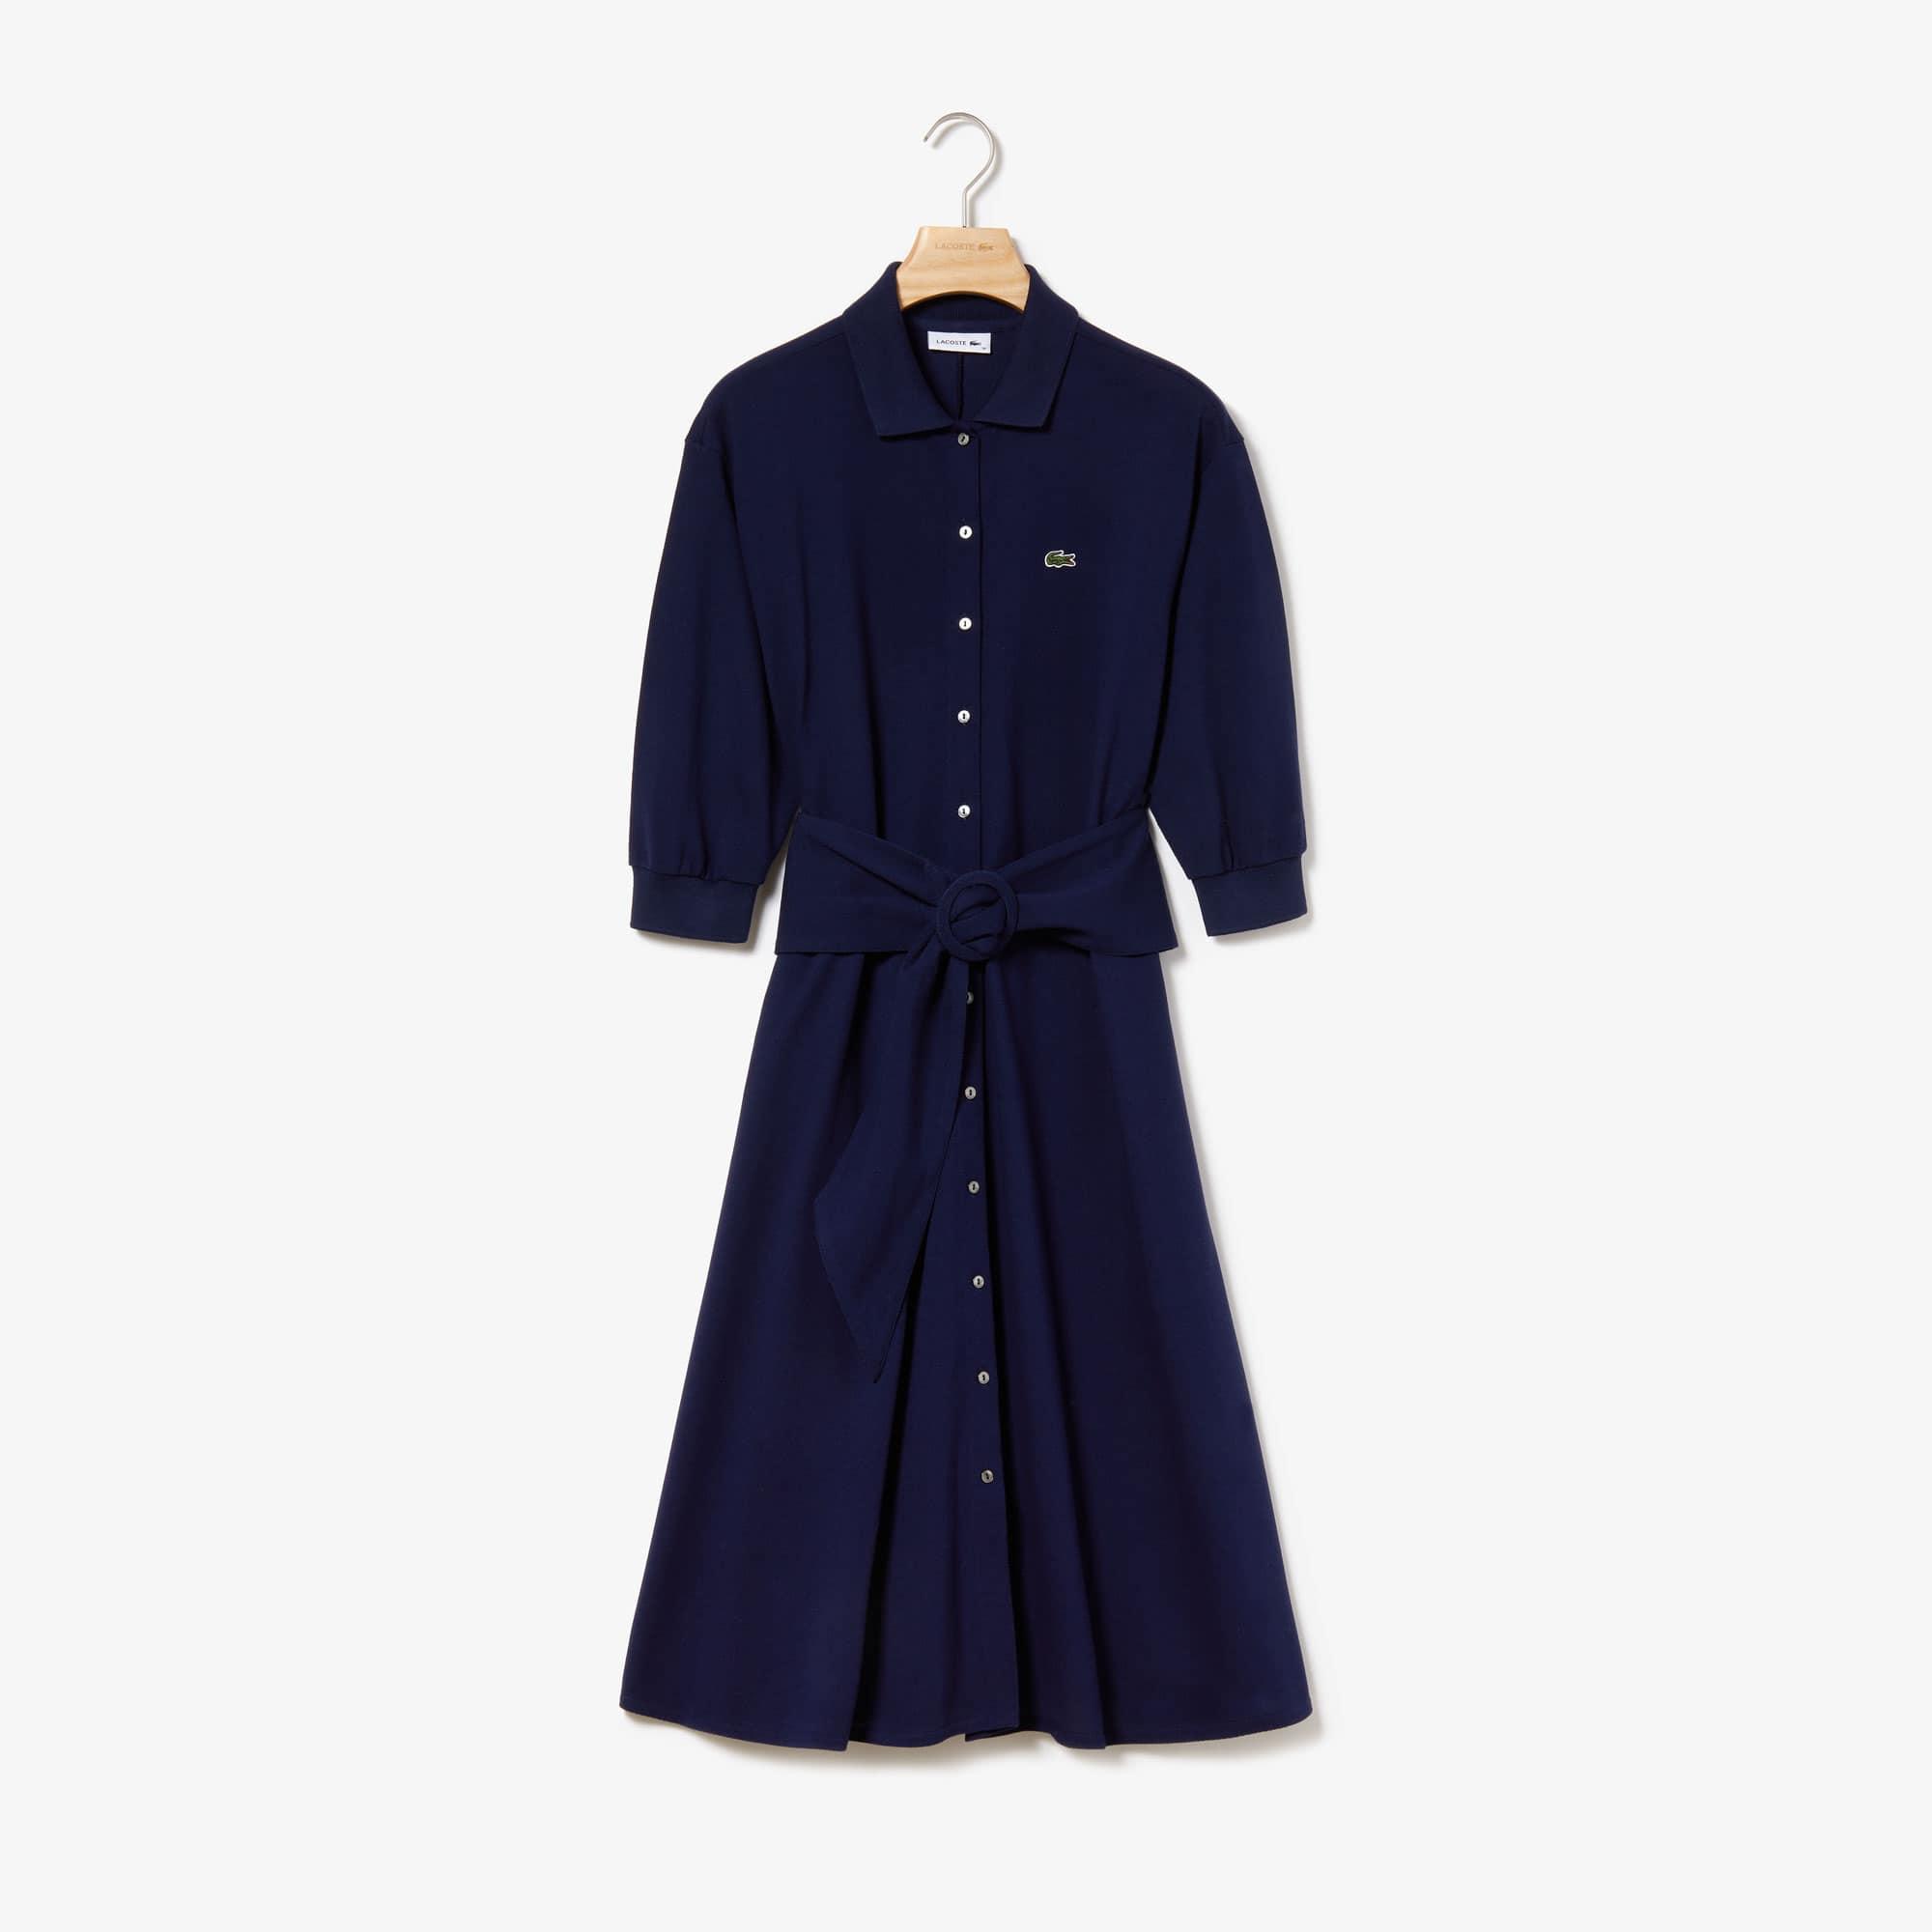 Women's Belted Buttoned Soft Petit Piqué Polo Dress